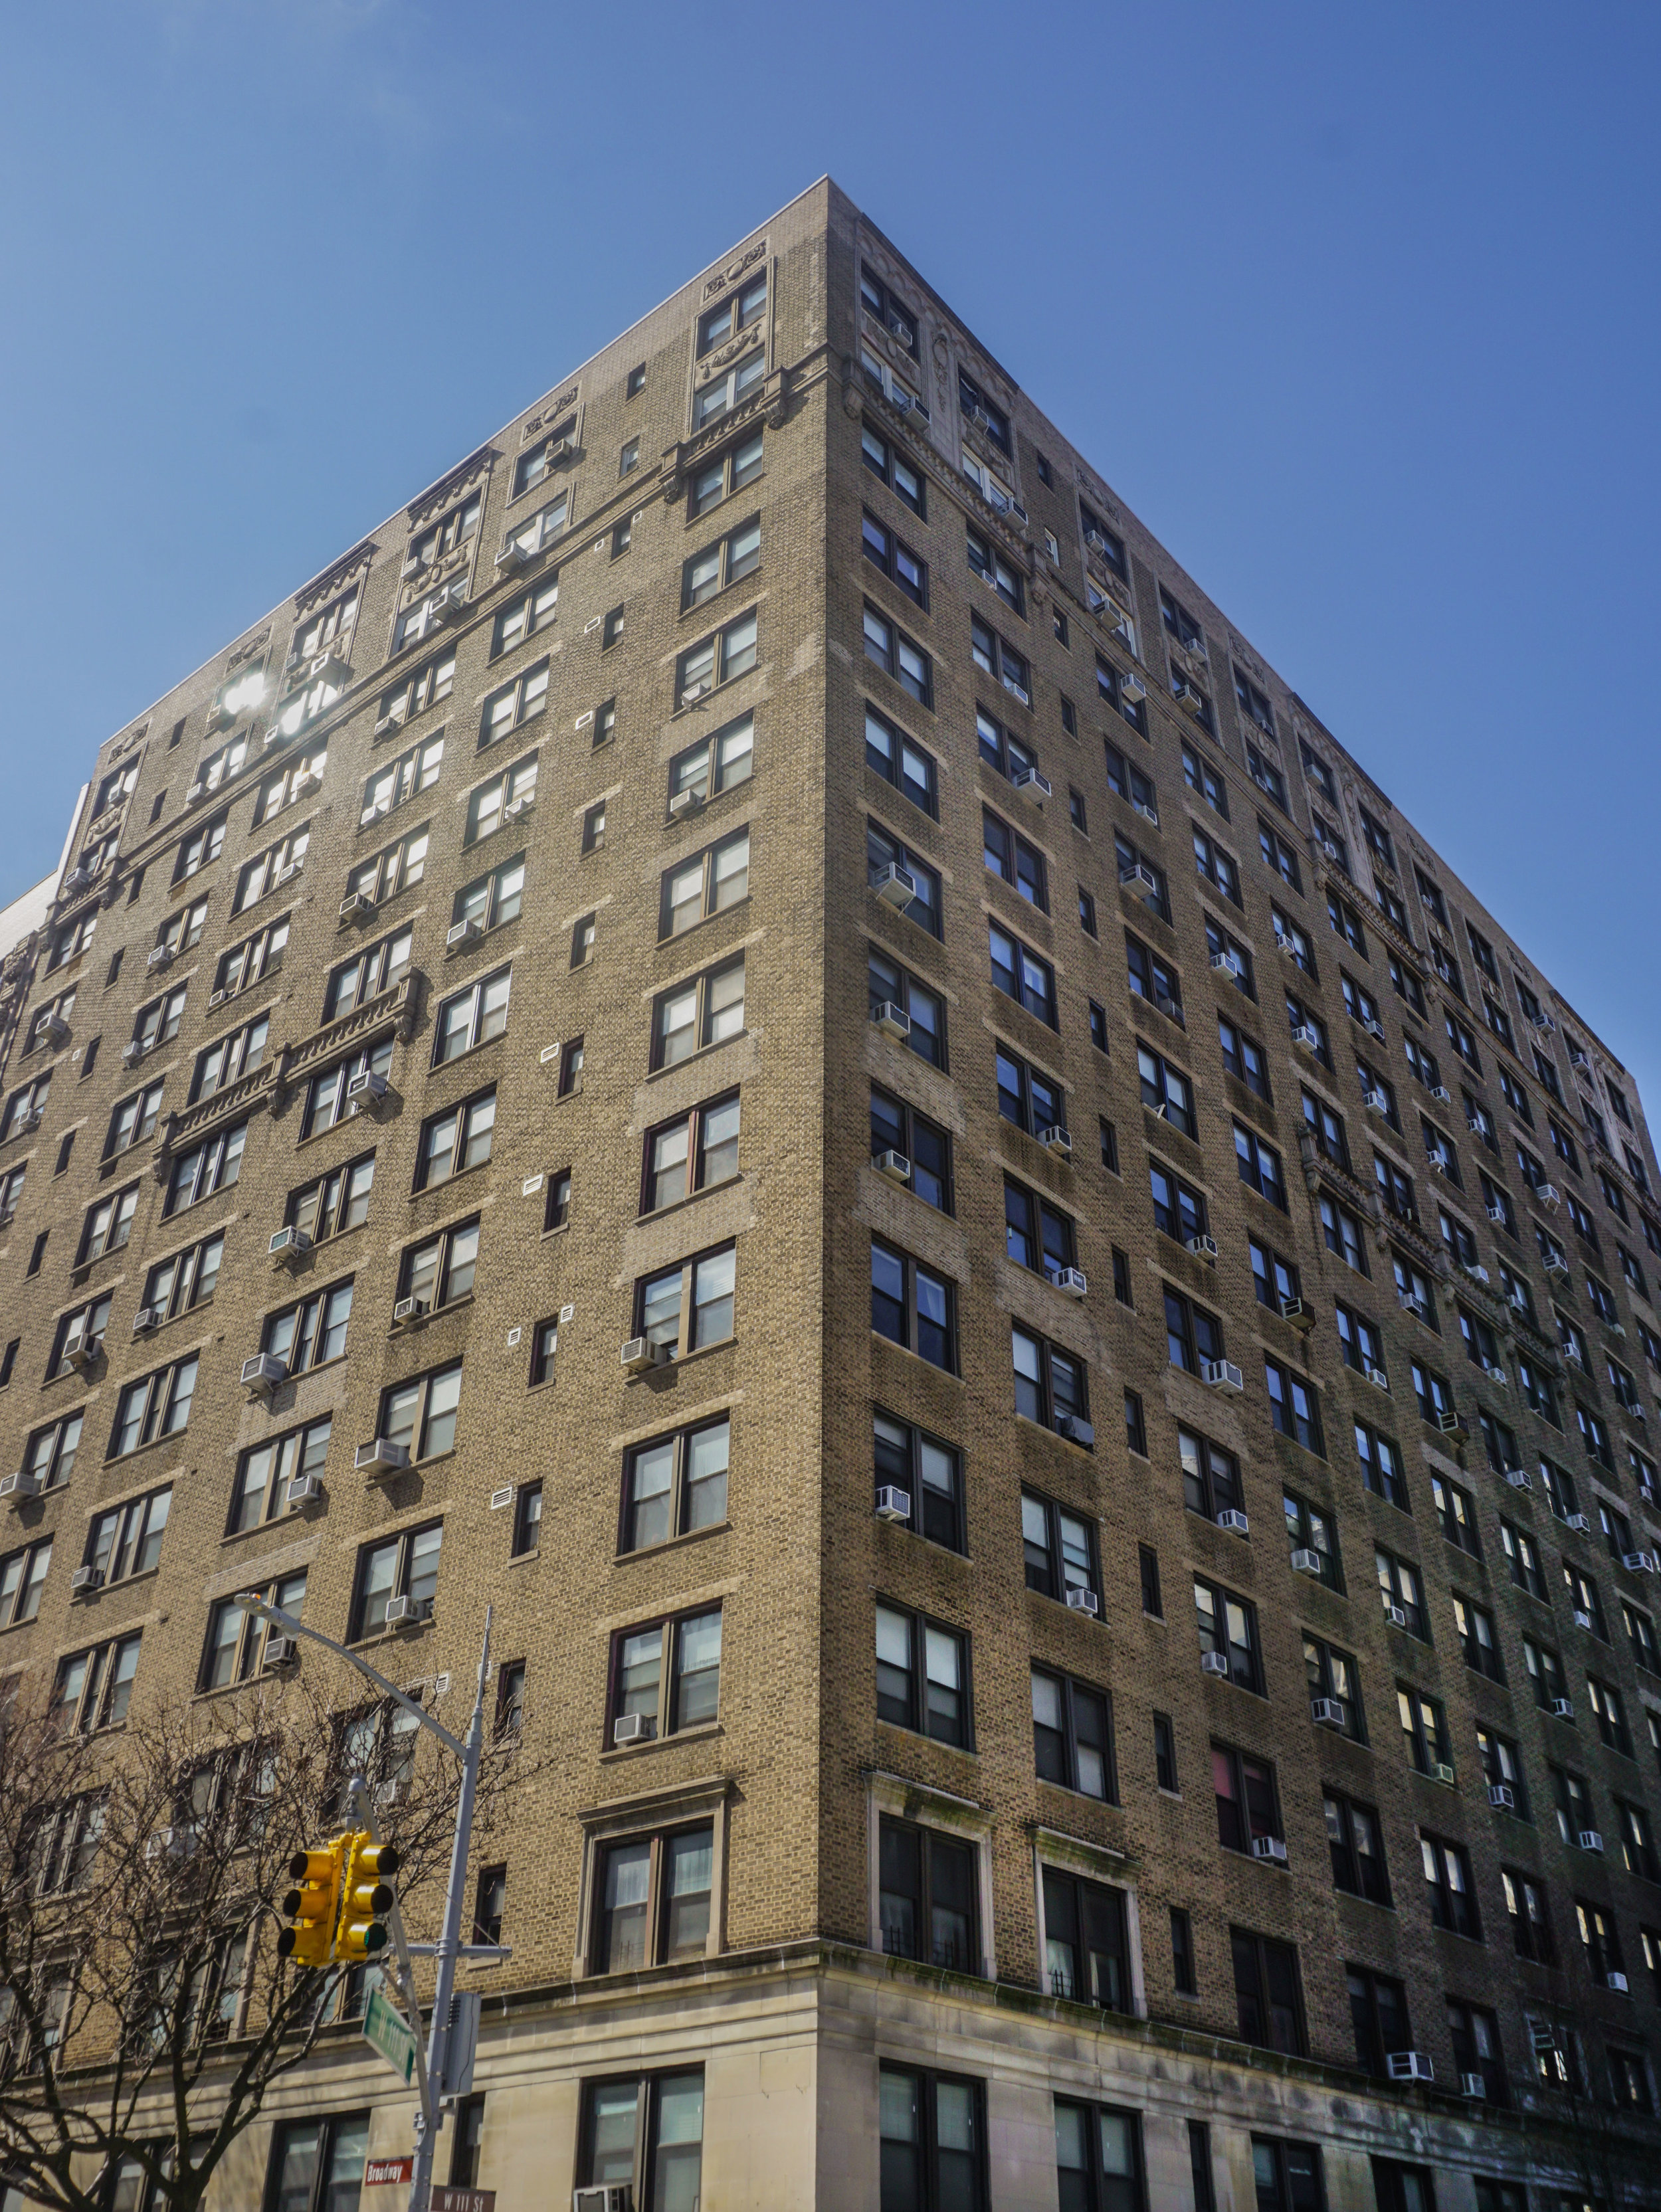 600 west 111th street -